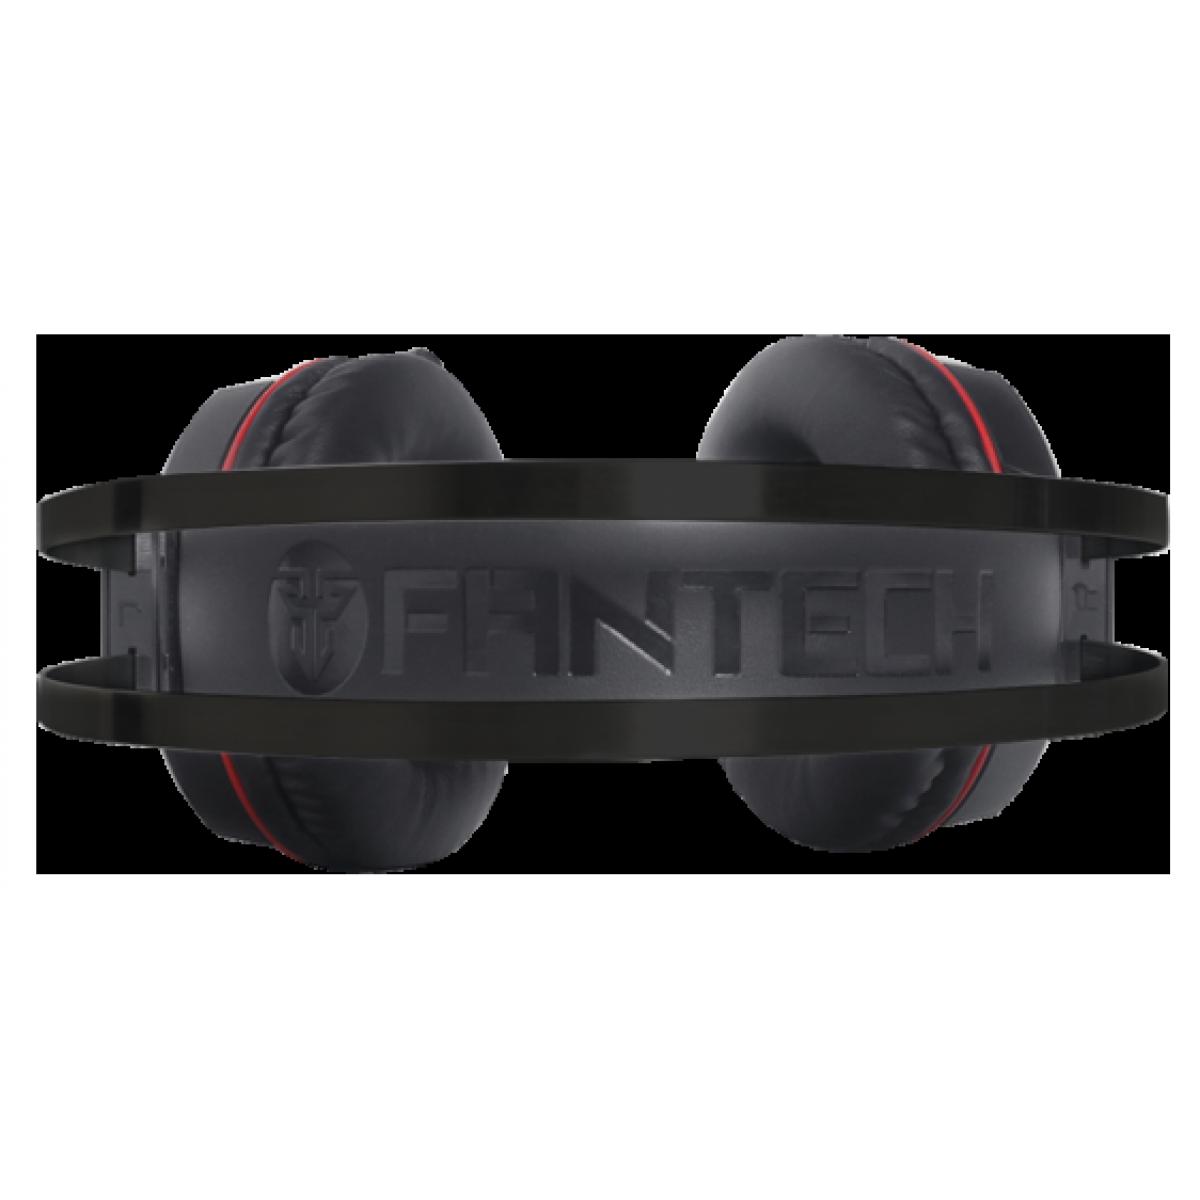 Headset Gamer Fantech Visage II, 2x3.5mm + USB, RGB, Black/RED, HG17s